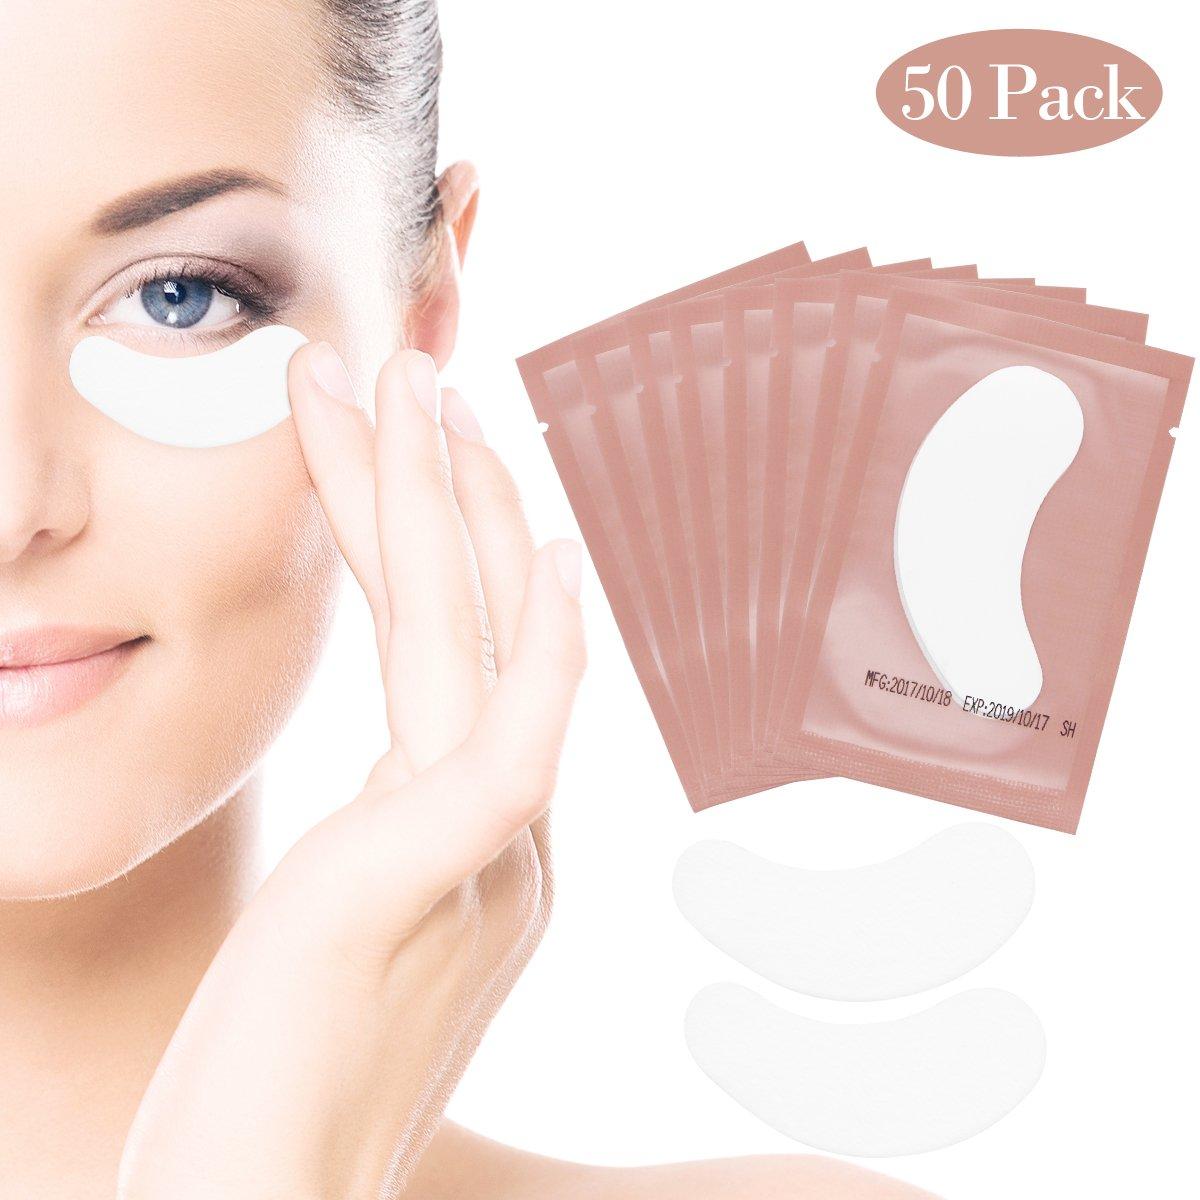 Eye Gel Pads - 50 Pairs of Eyelash Lash Extension Under Eye Gel Pads Lint Eye Patches (Pink) LADES